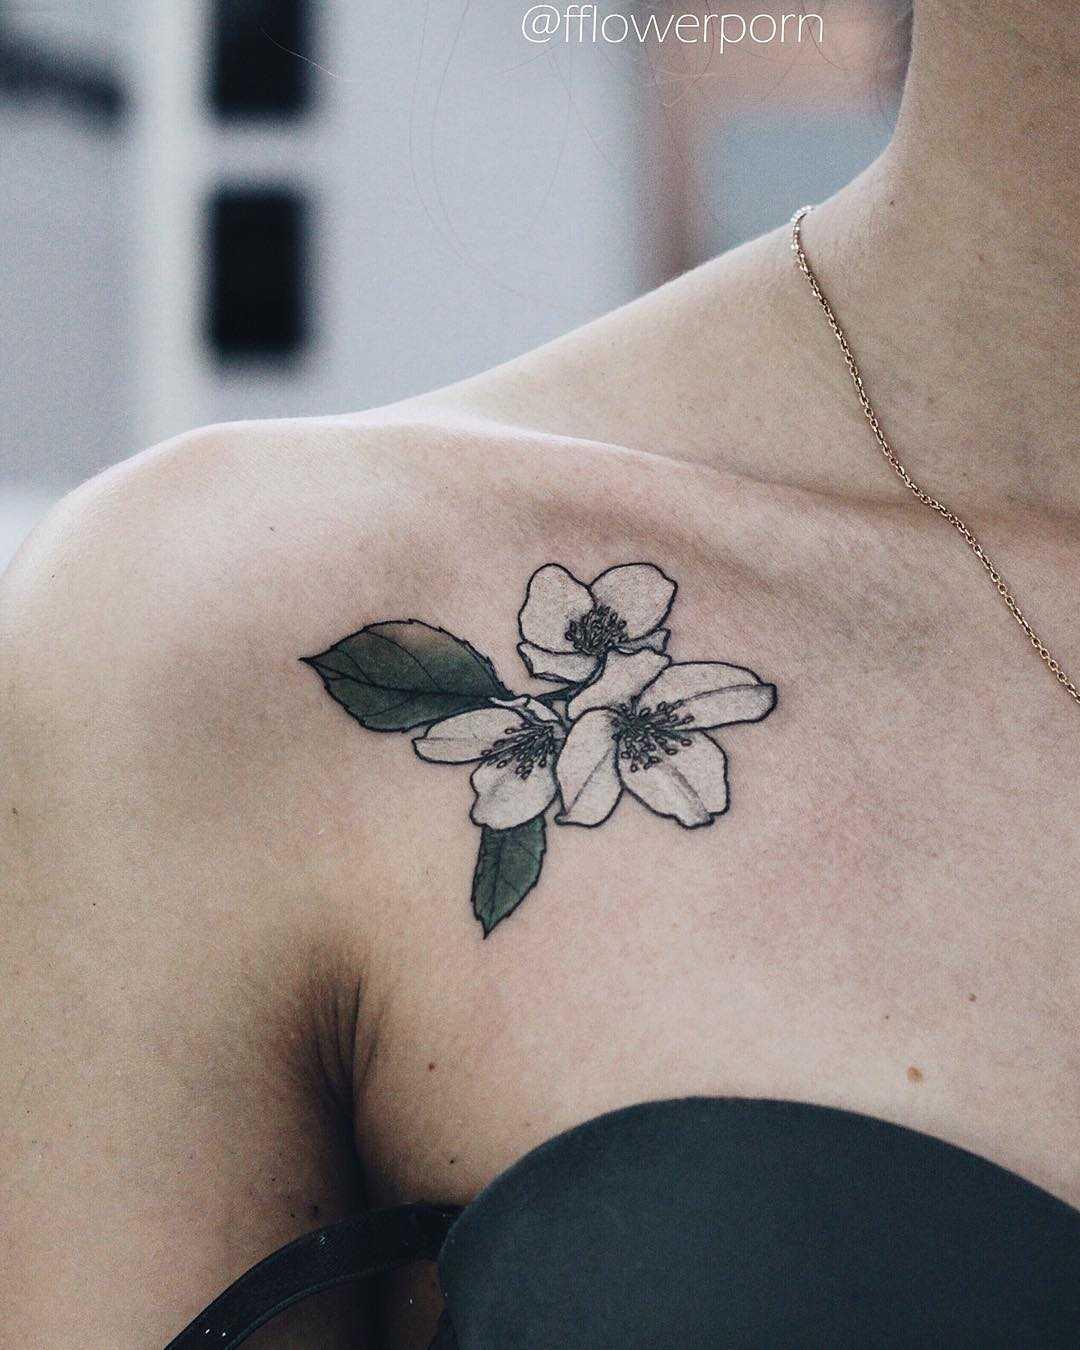 Tiny jasmine tattoo on the collarbone